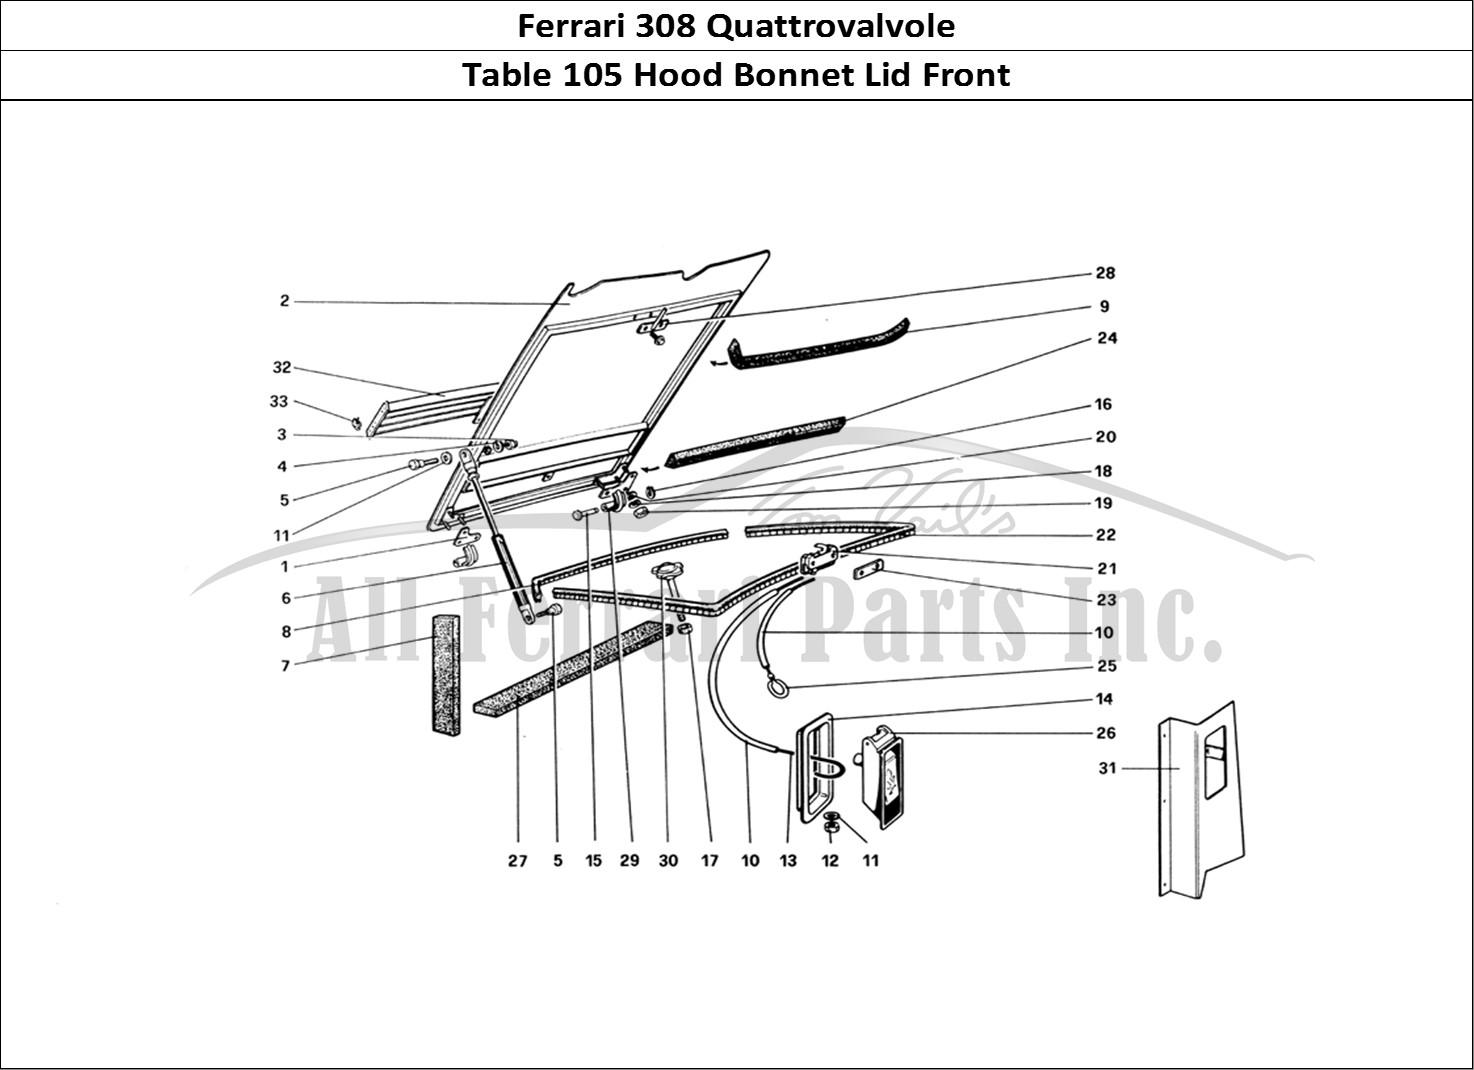 Buy original Ferrari 308 Quattrovalvole 105 Hood Bonnet